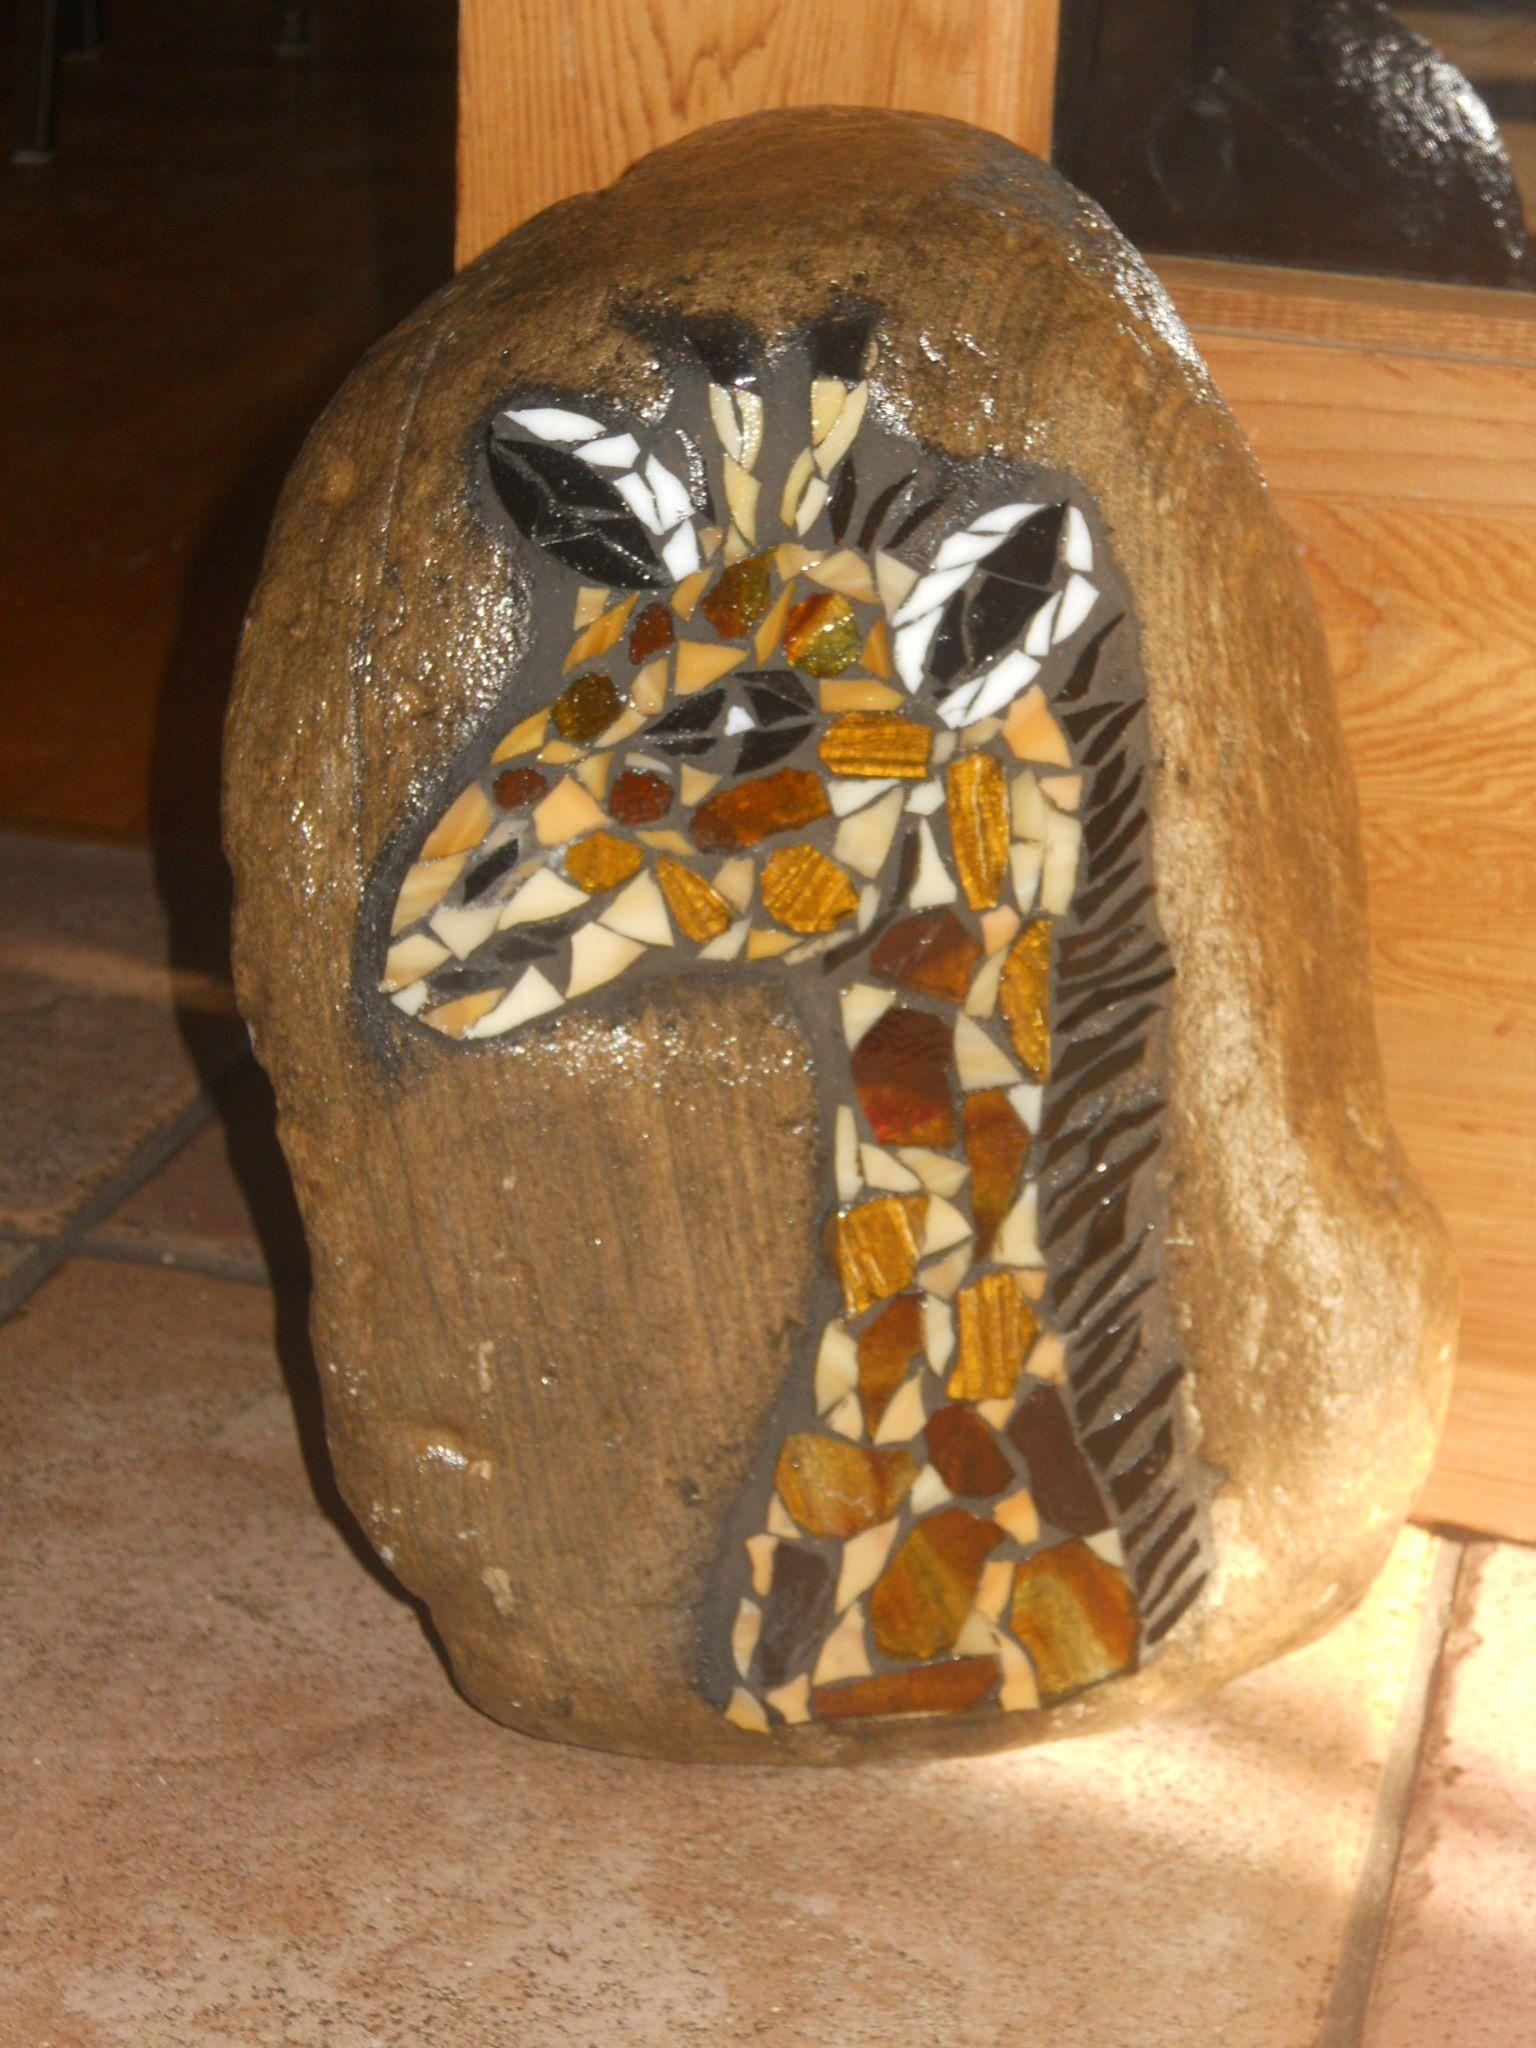 Mosaic Giraffe Doorstop Made of recycled glass